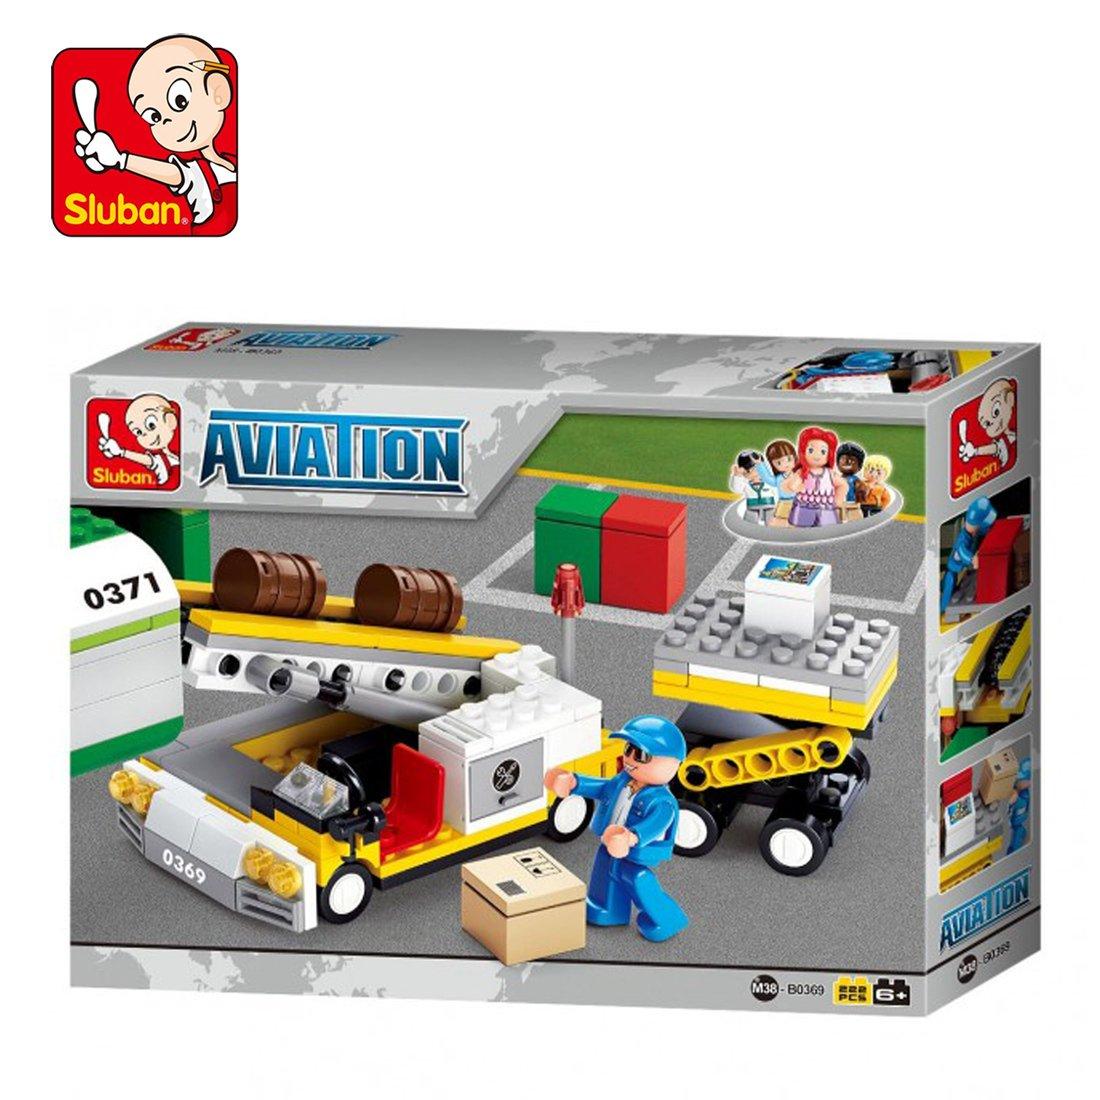 Sluban SlubanM38-B0369 Aircraft Cargo Loader Building Bricks Set